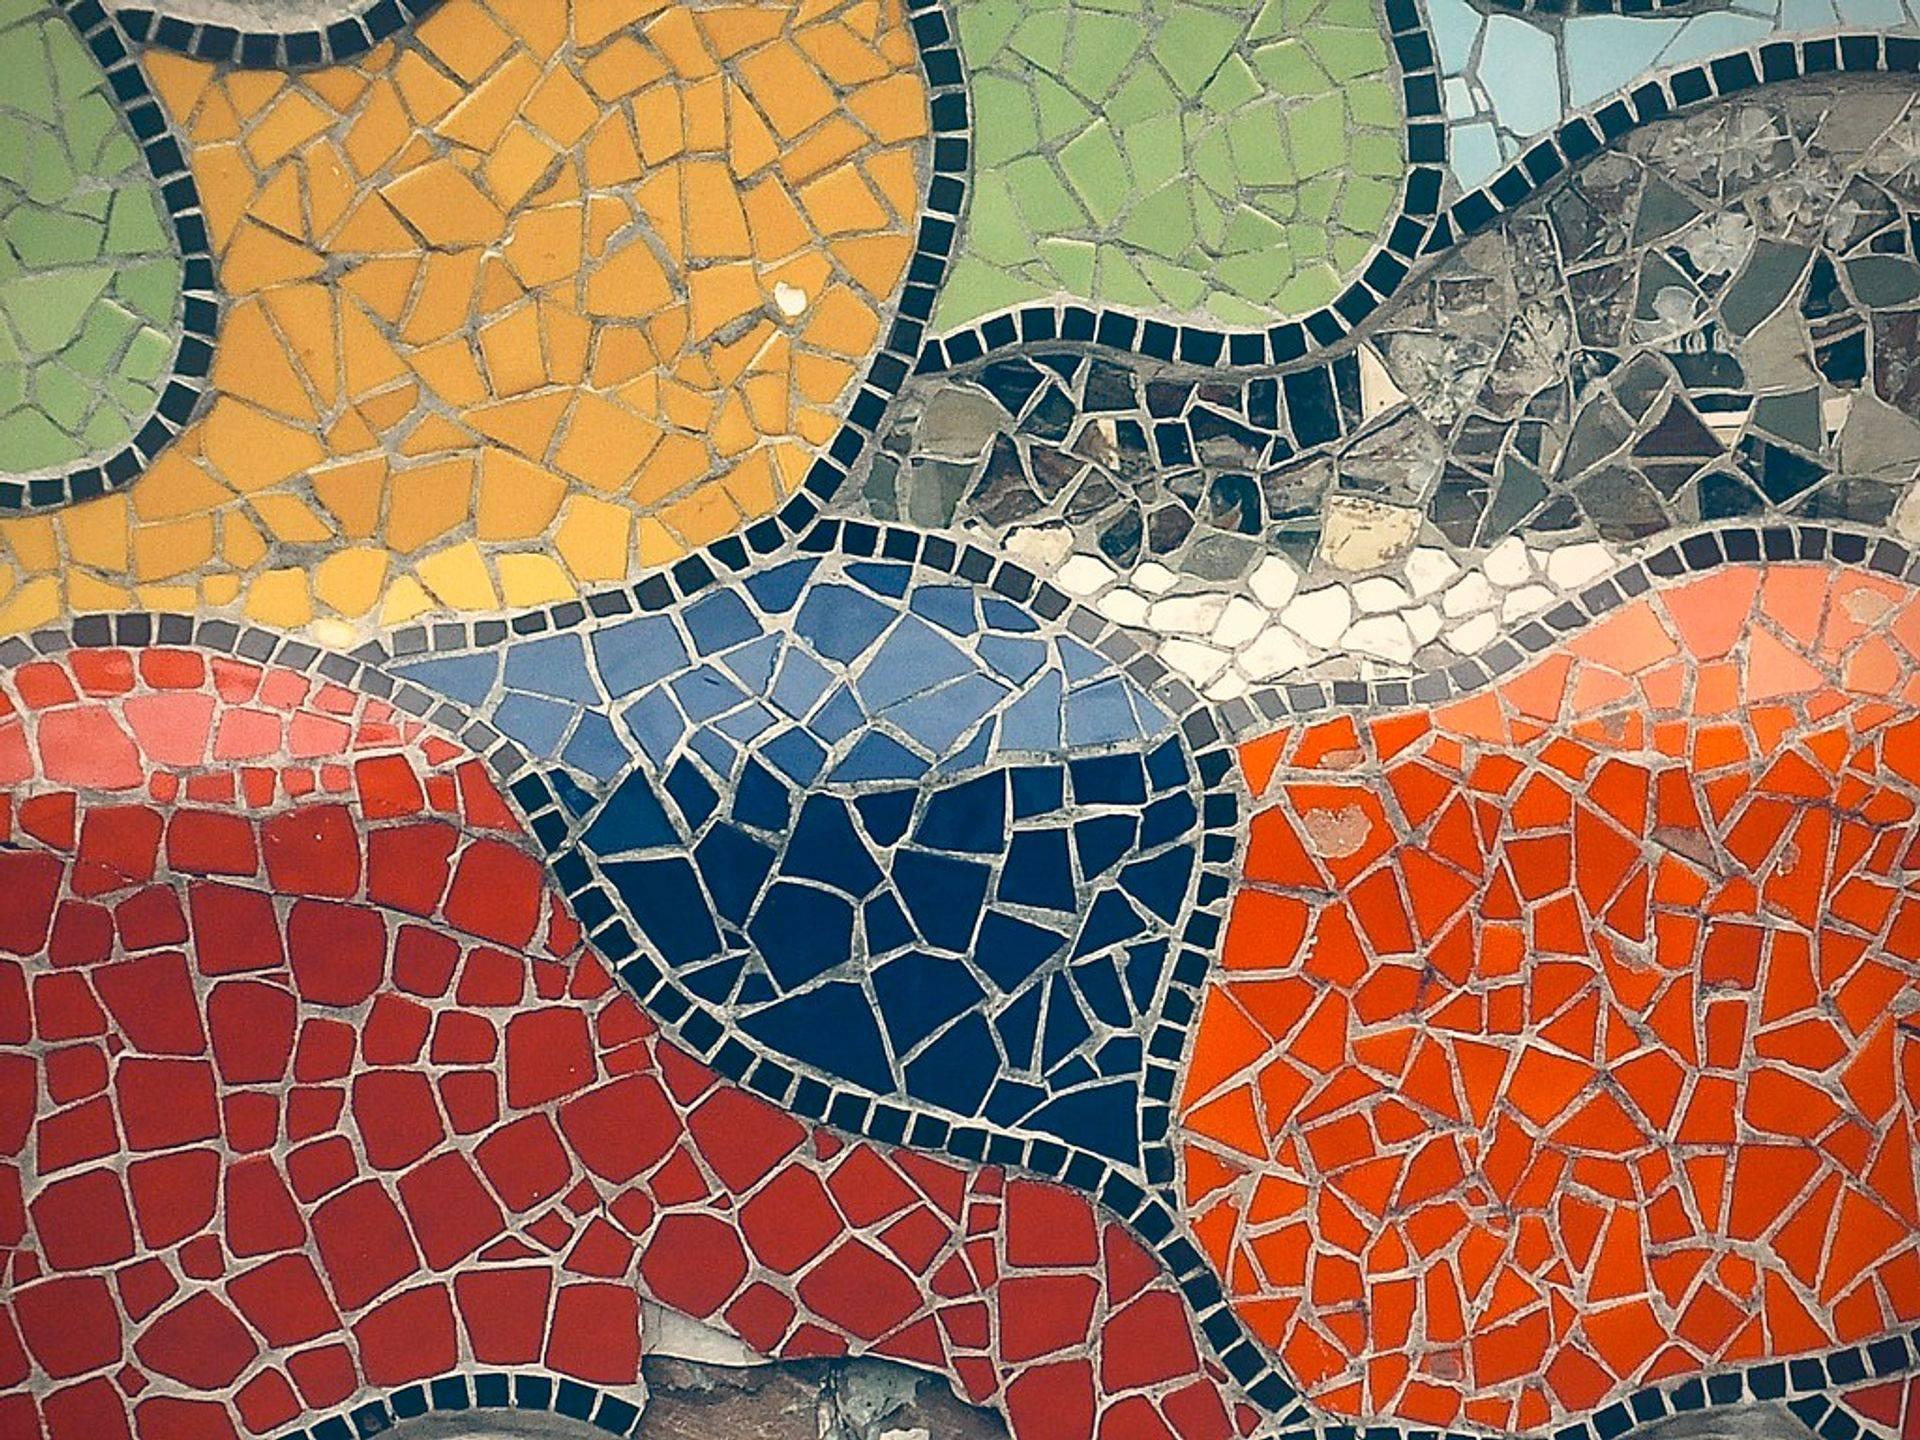 Mosaic, Shoals Yoga Massage Therapy Counseling Florence AL 35630